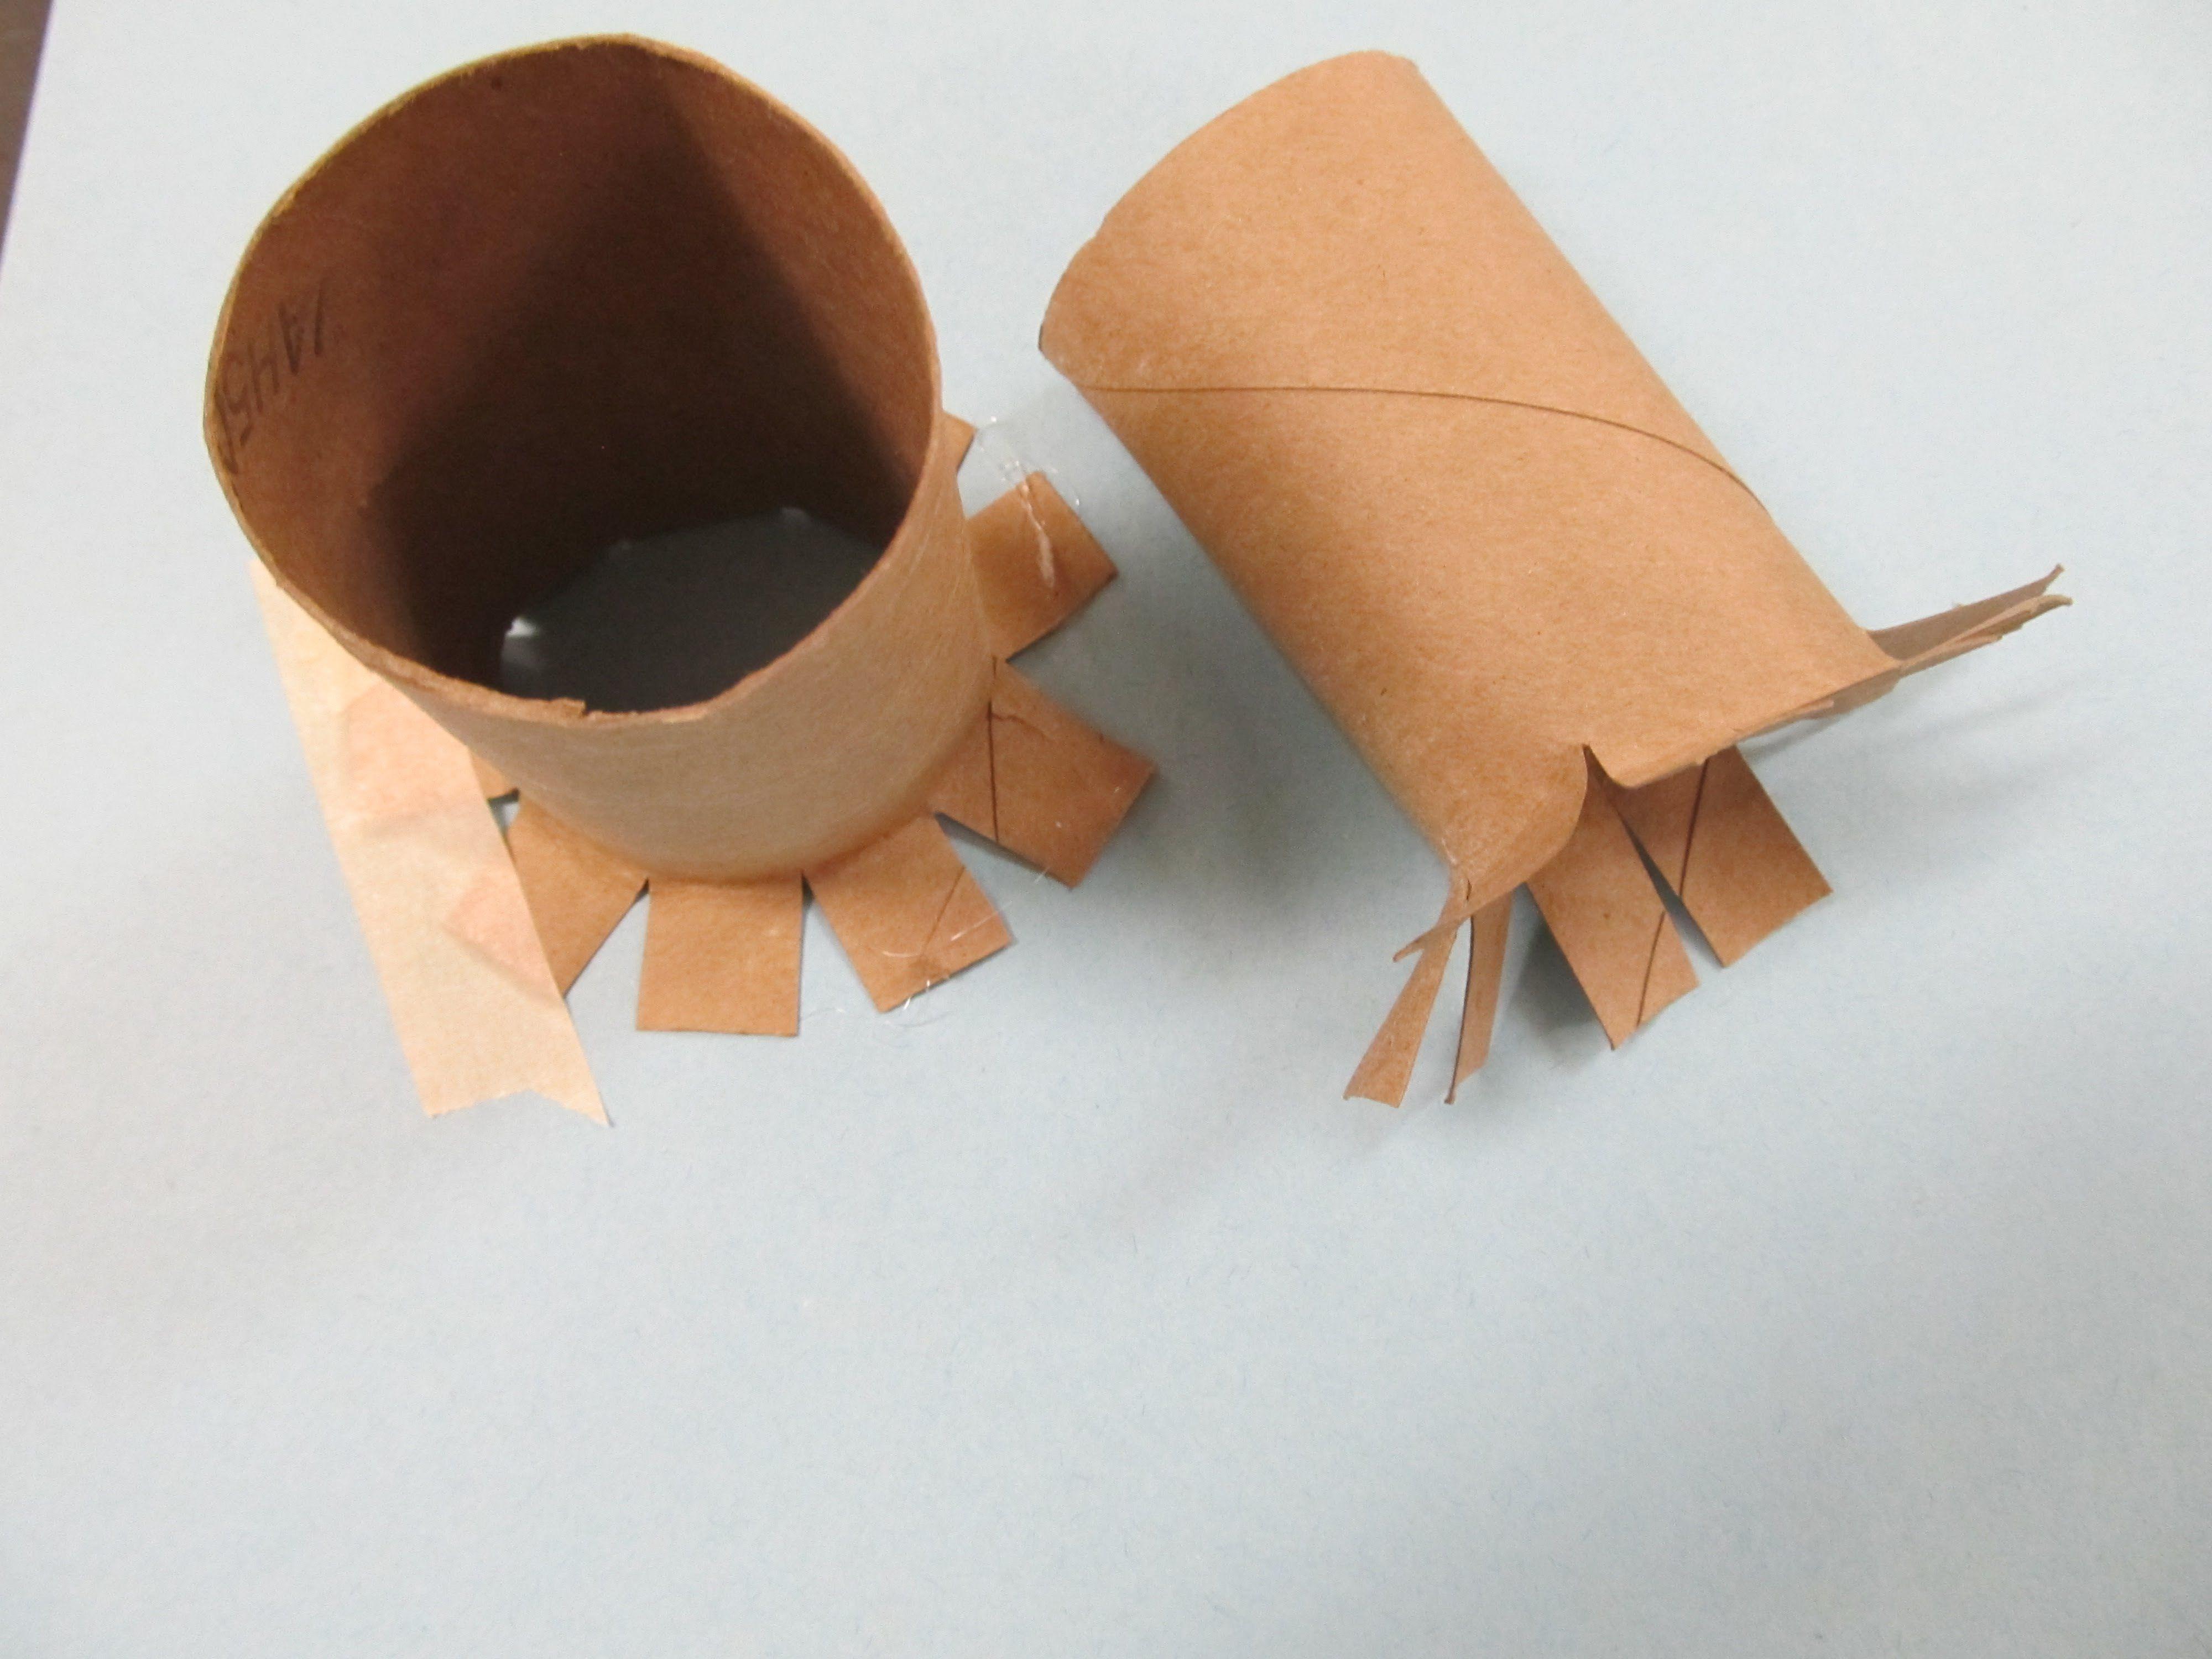 Paper Mache Techniques Using Cardboard Paper Mache Paper Mache Sculpture Cardboard Sculpture